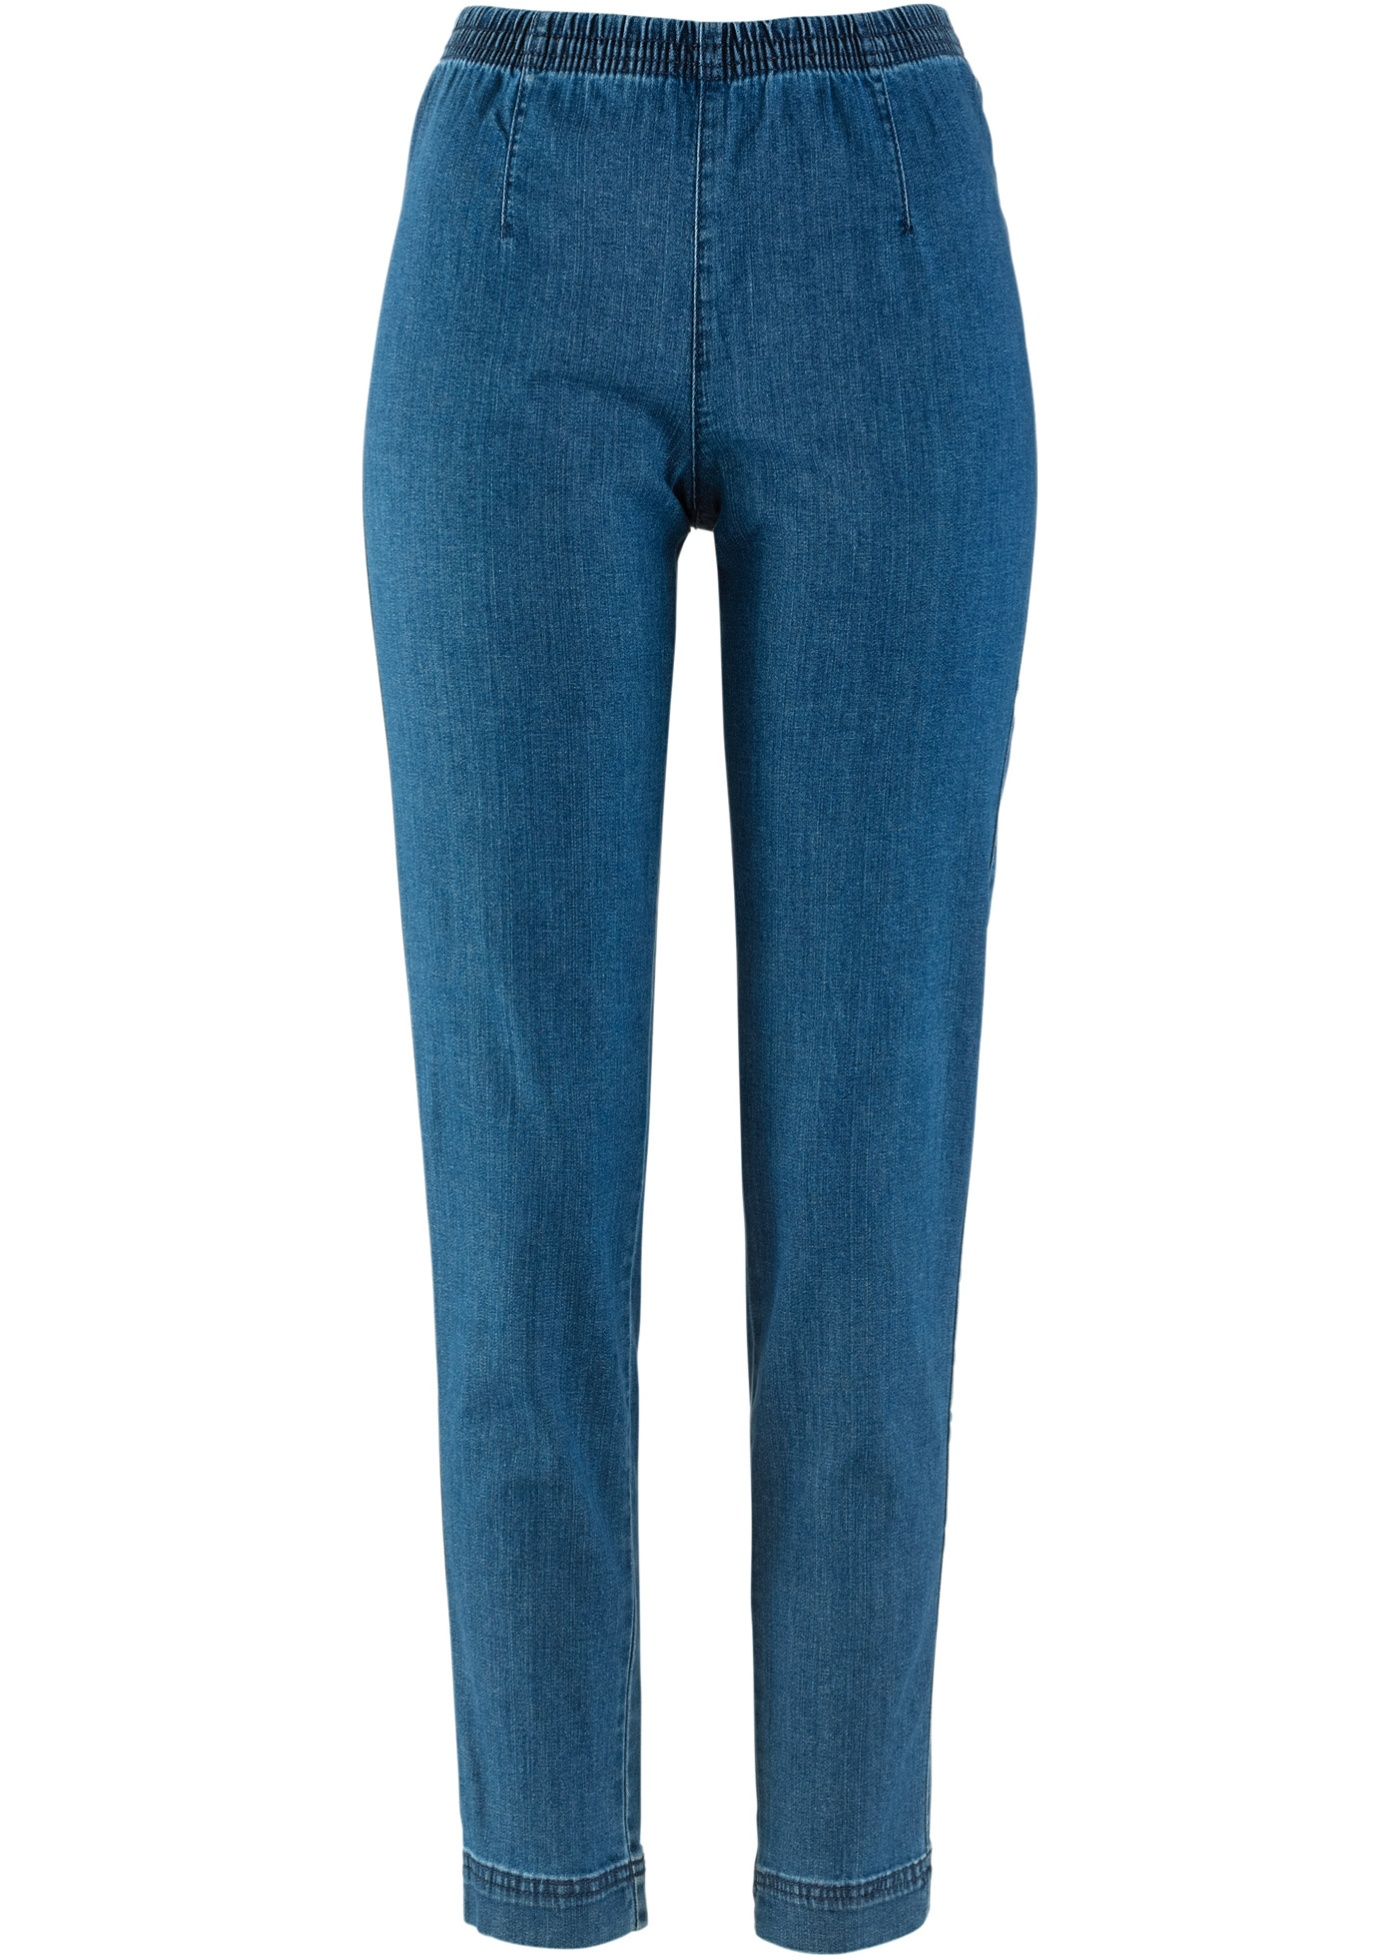 Bonprix - Jeans 199.00